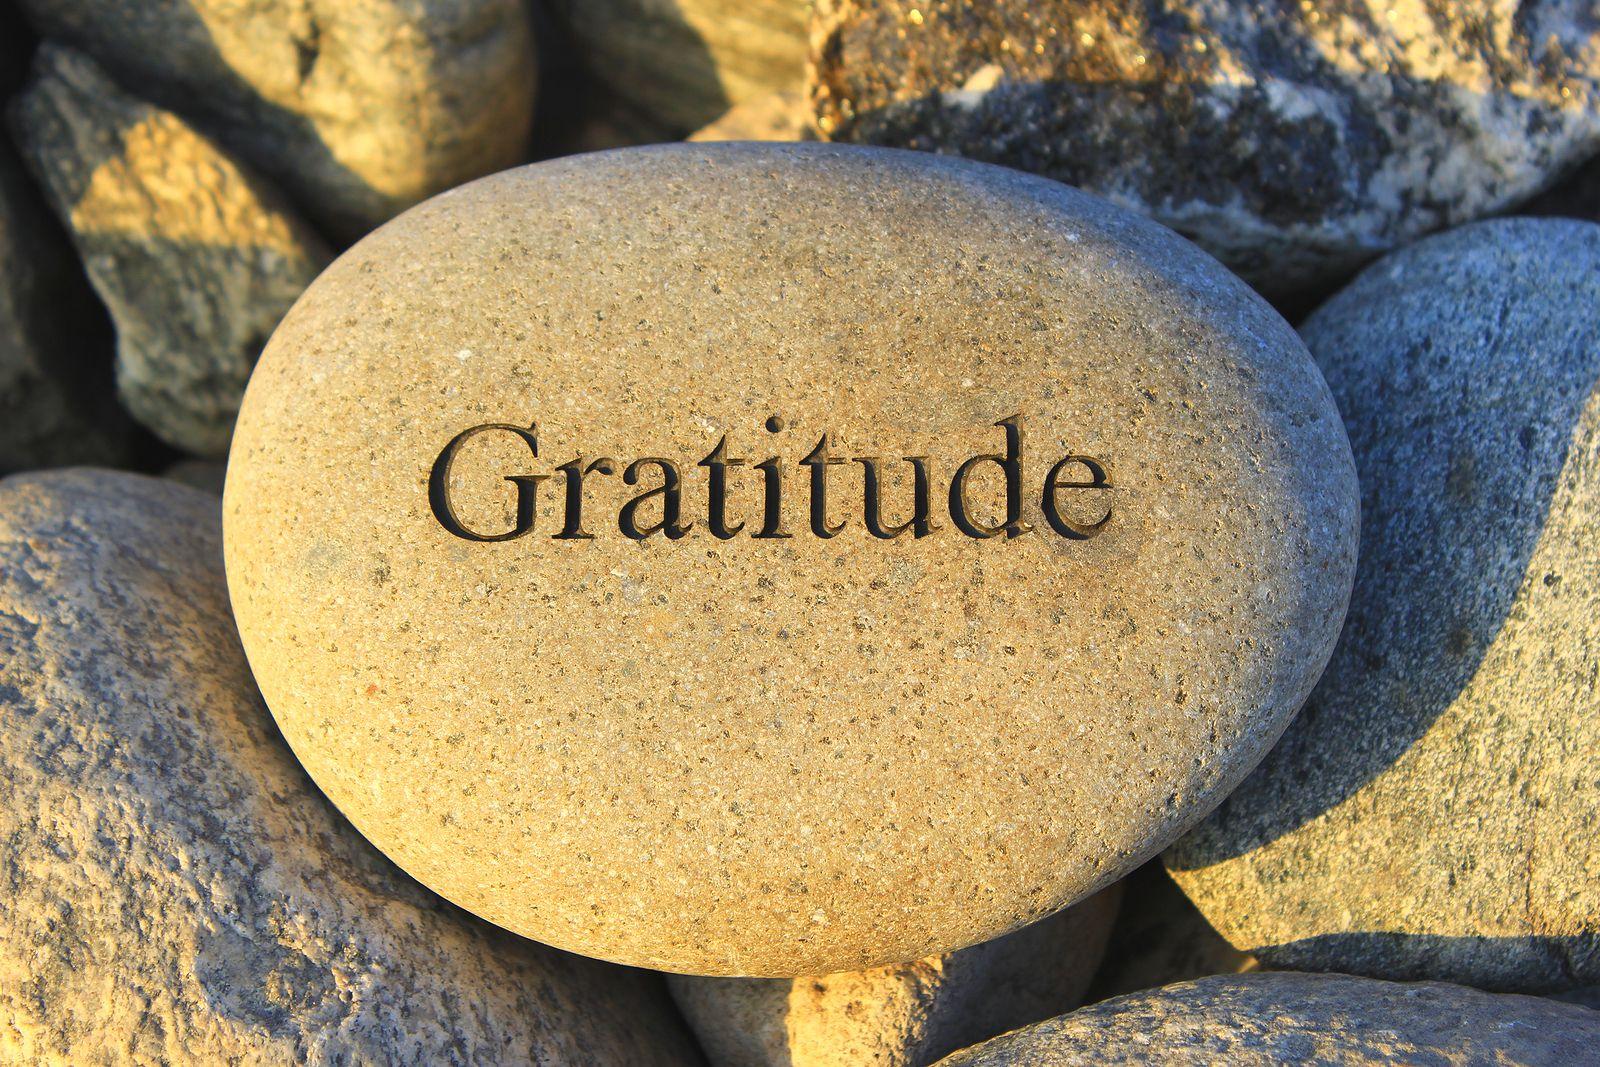 Billede fra http://bobbleheaddad.com/wp-content/uploads/2015/05/Gratitude-rock.jpg.